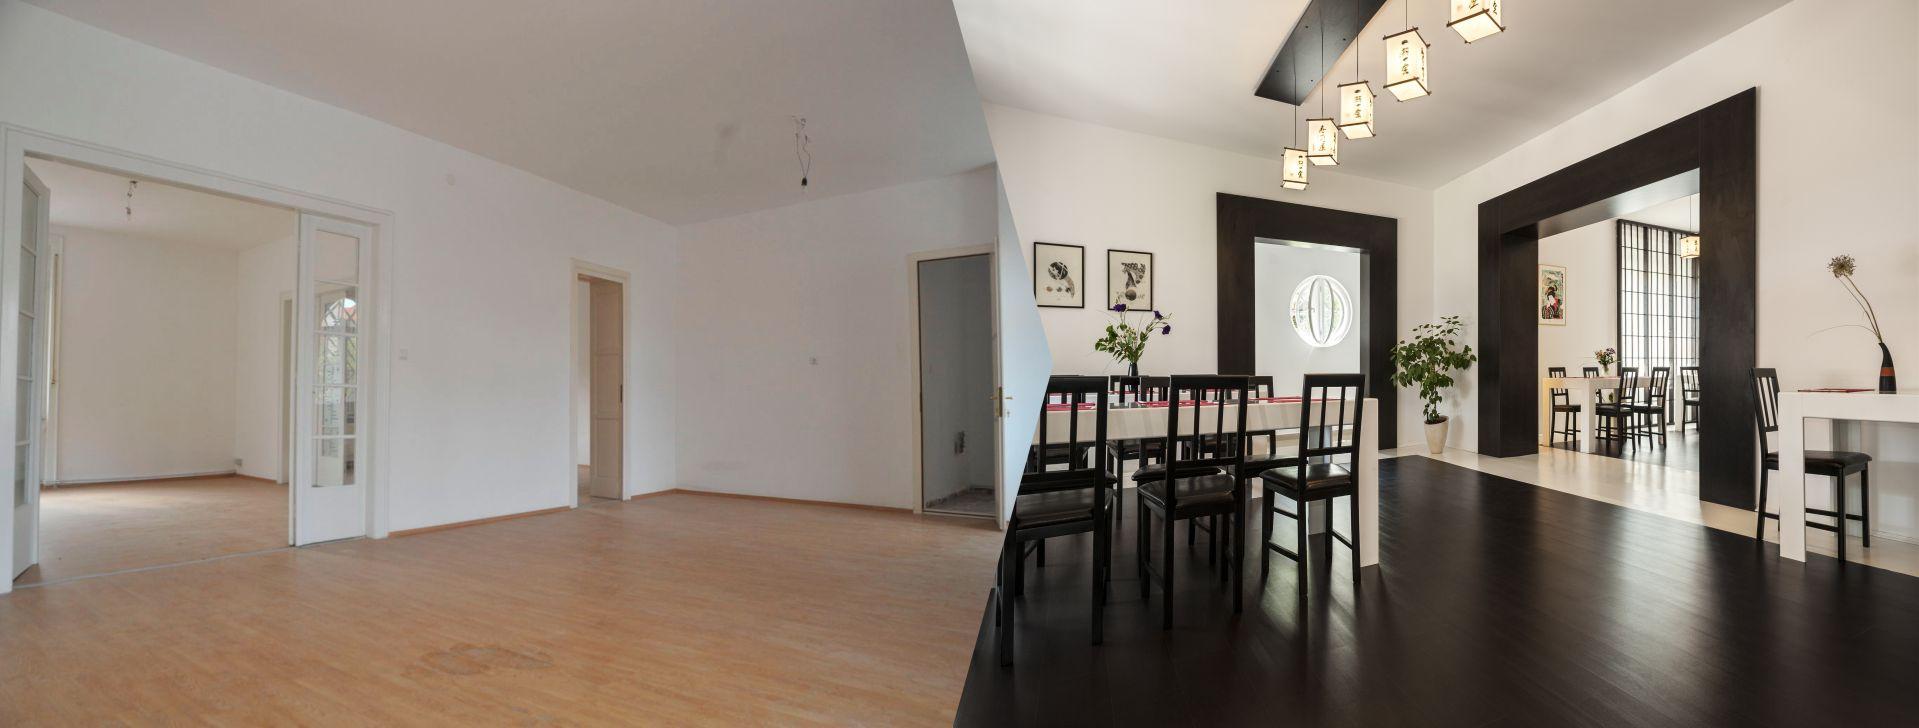 innendesign great modernes innendesign with innendesign. Black Bedroom Furniture Sets. Home Design Ideas